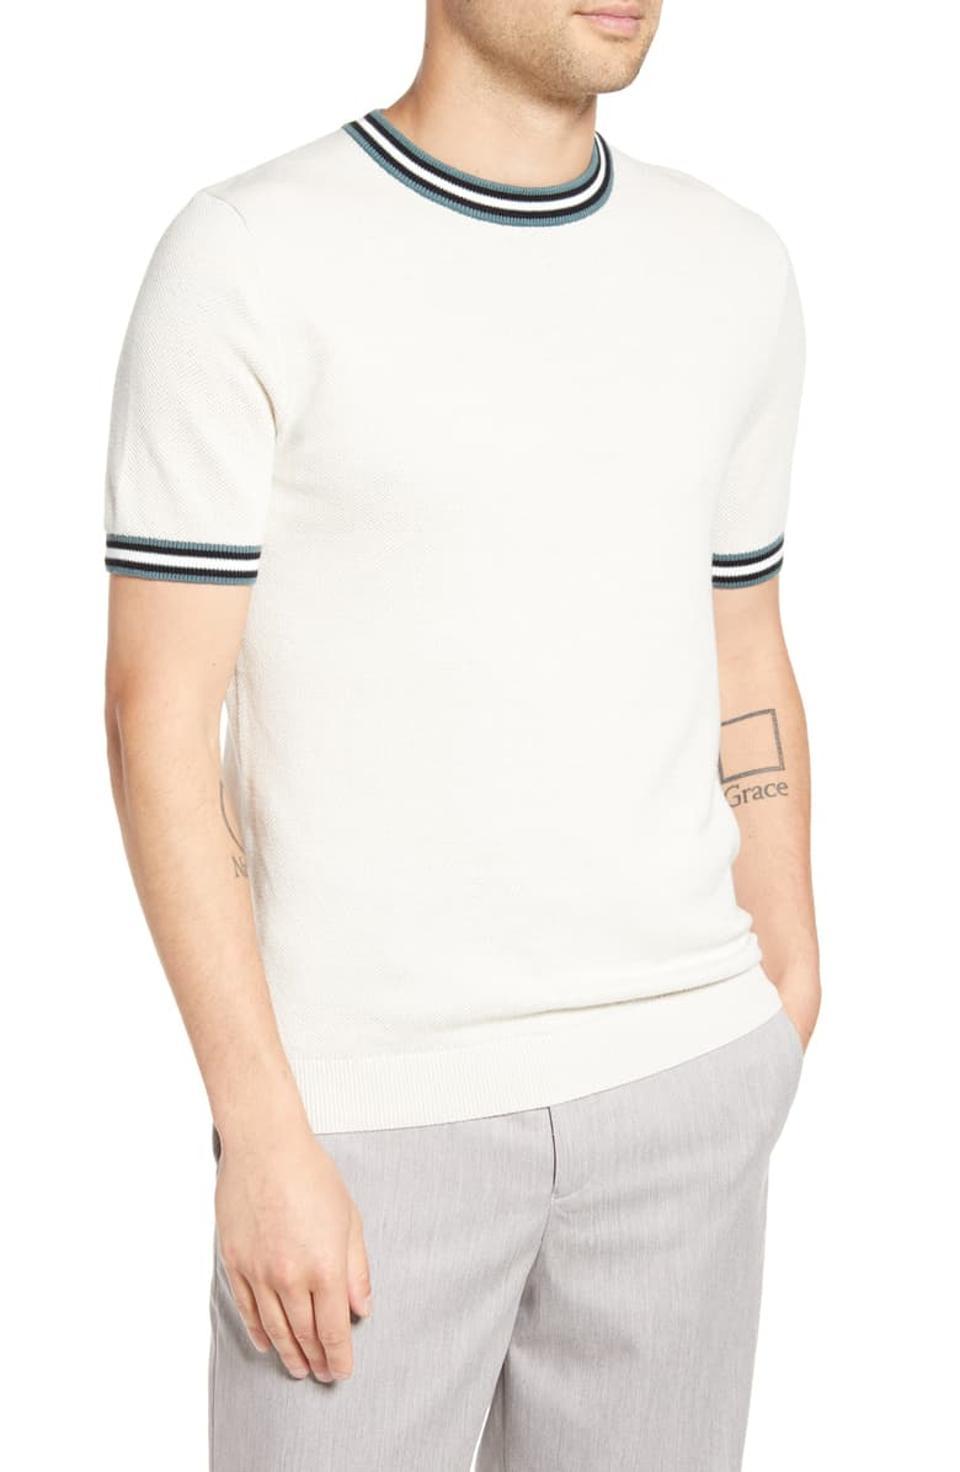 Topman Tipped Piqué T-Shirt